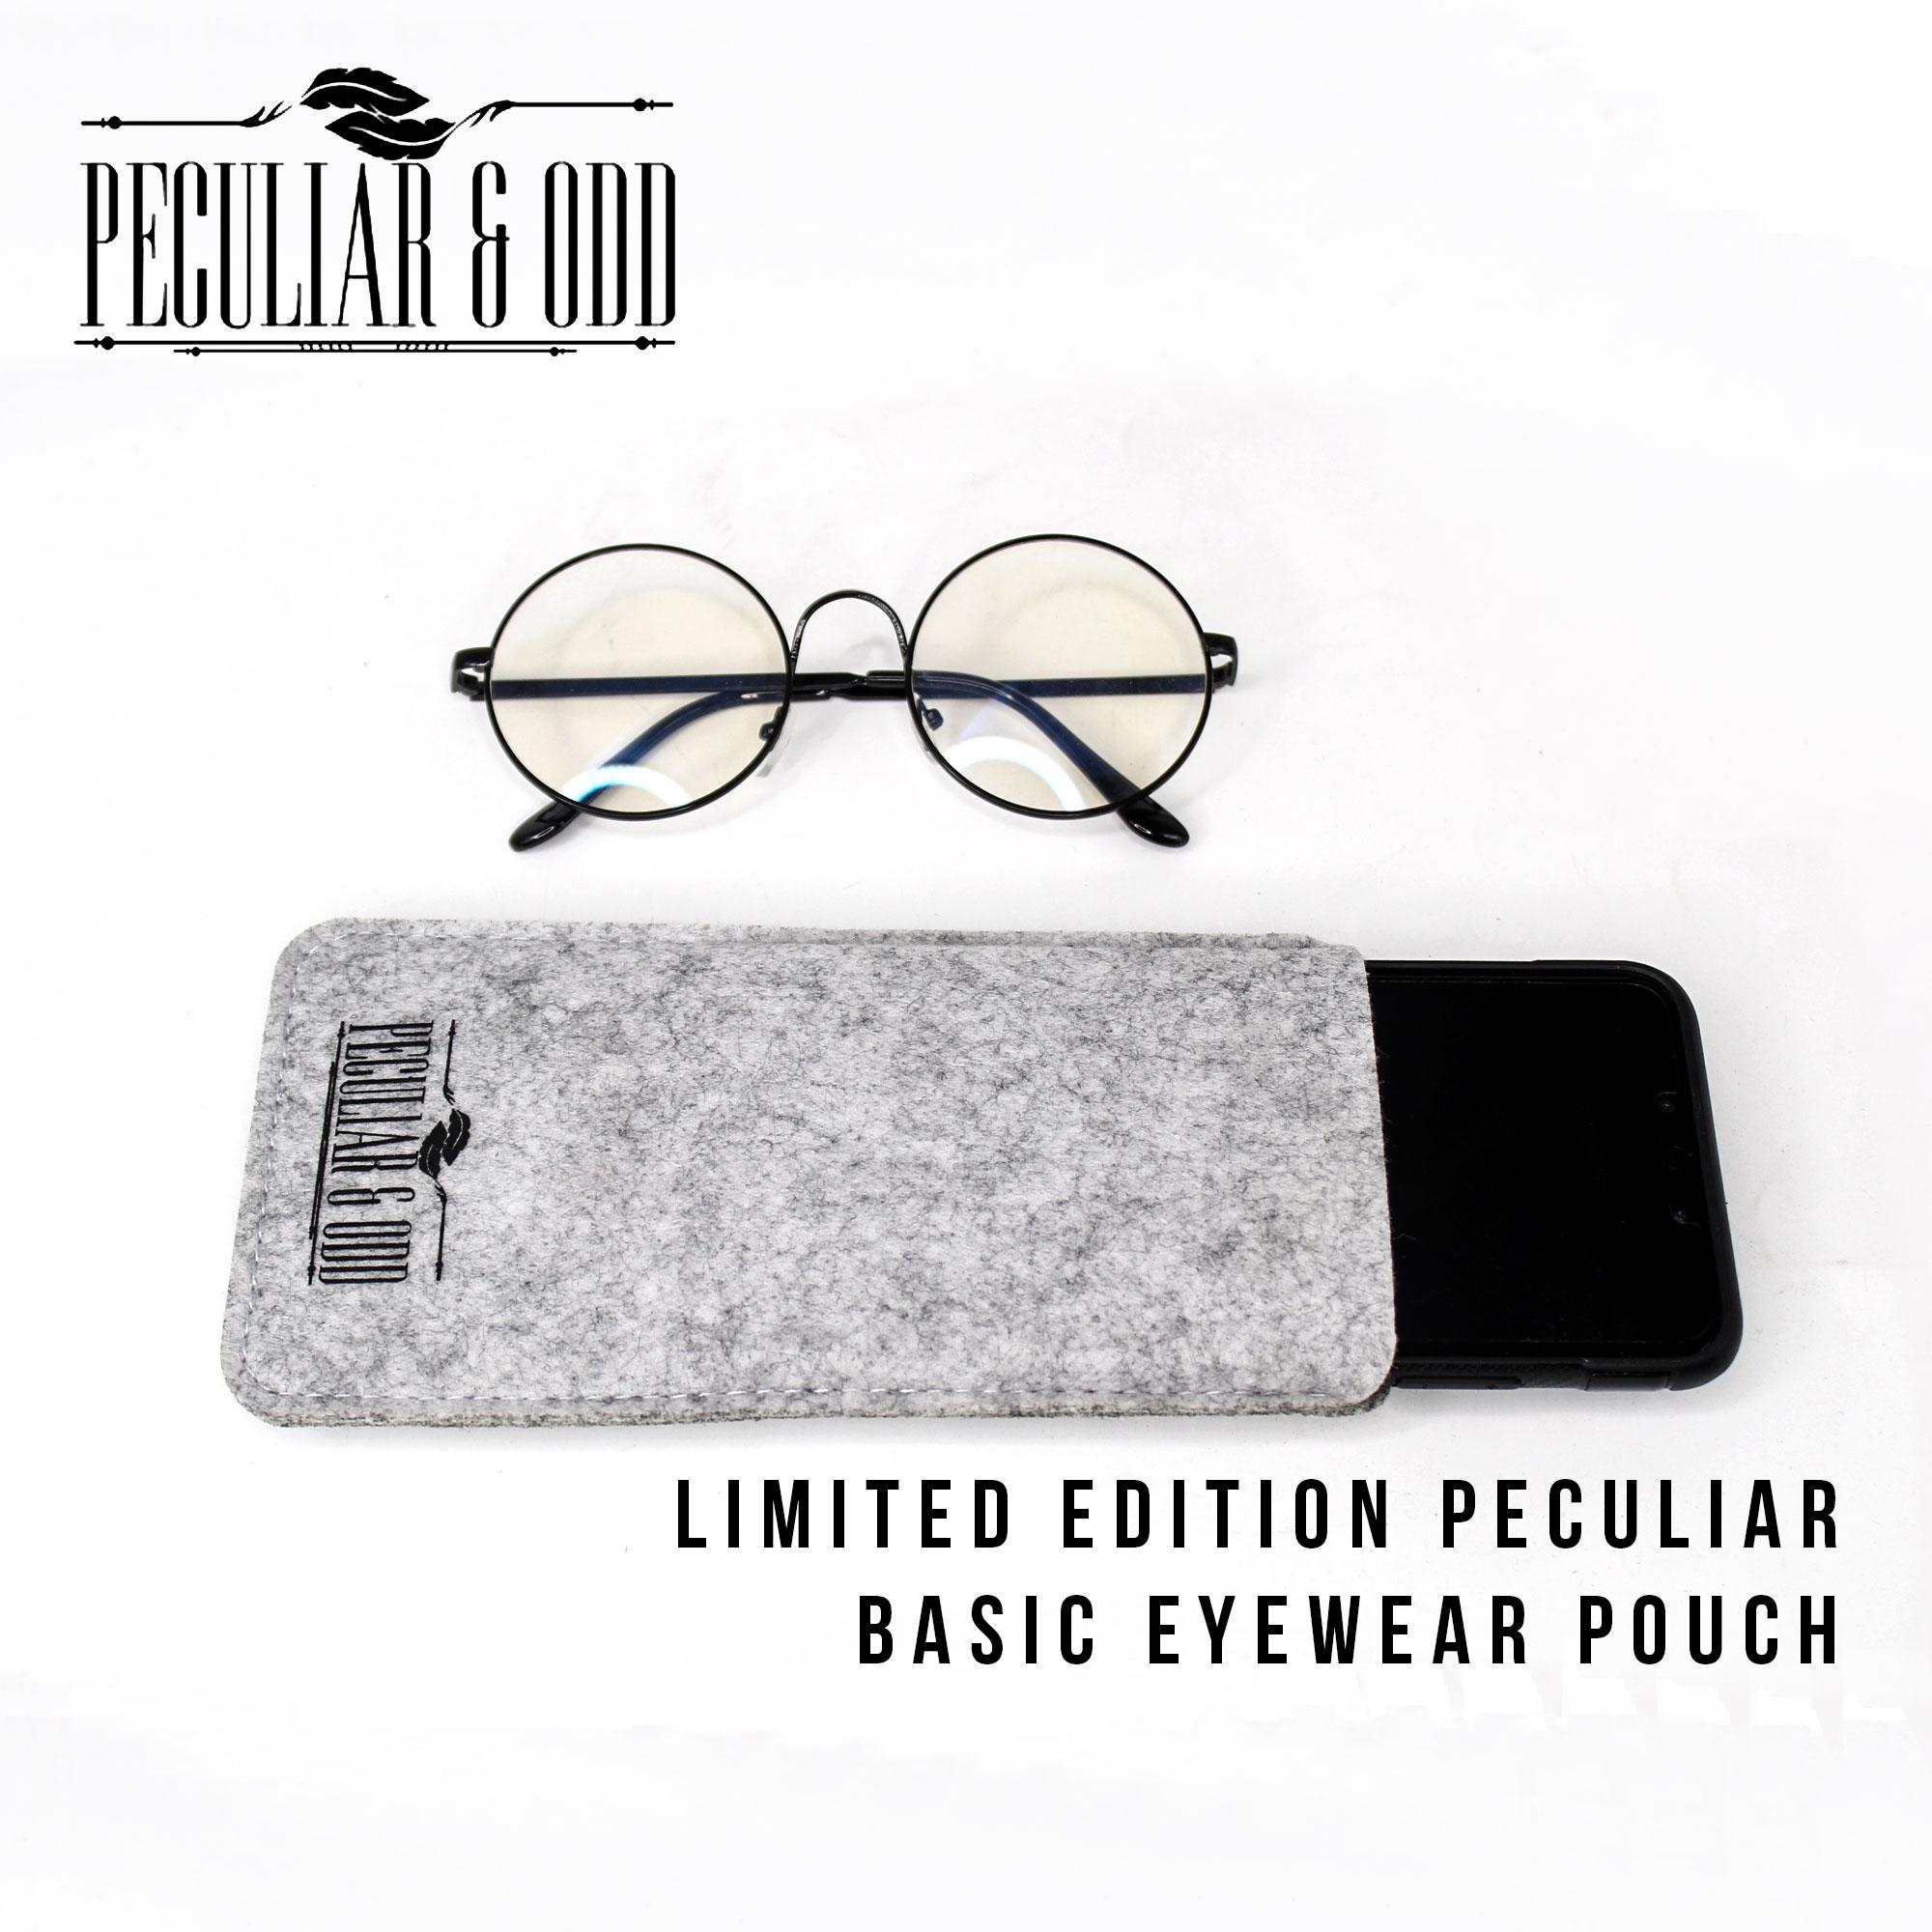 999487253a1c Eyeglass Accessories for sale - Eyewear Accessories online brands ...